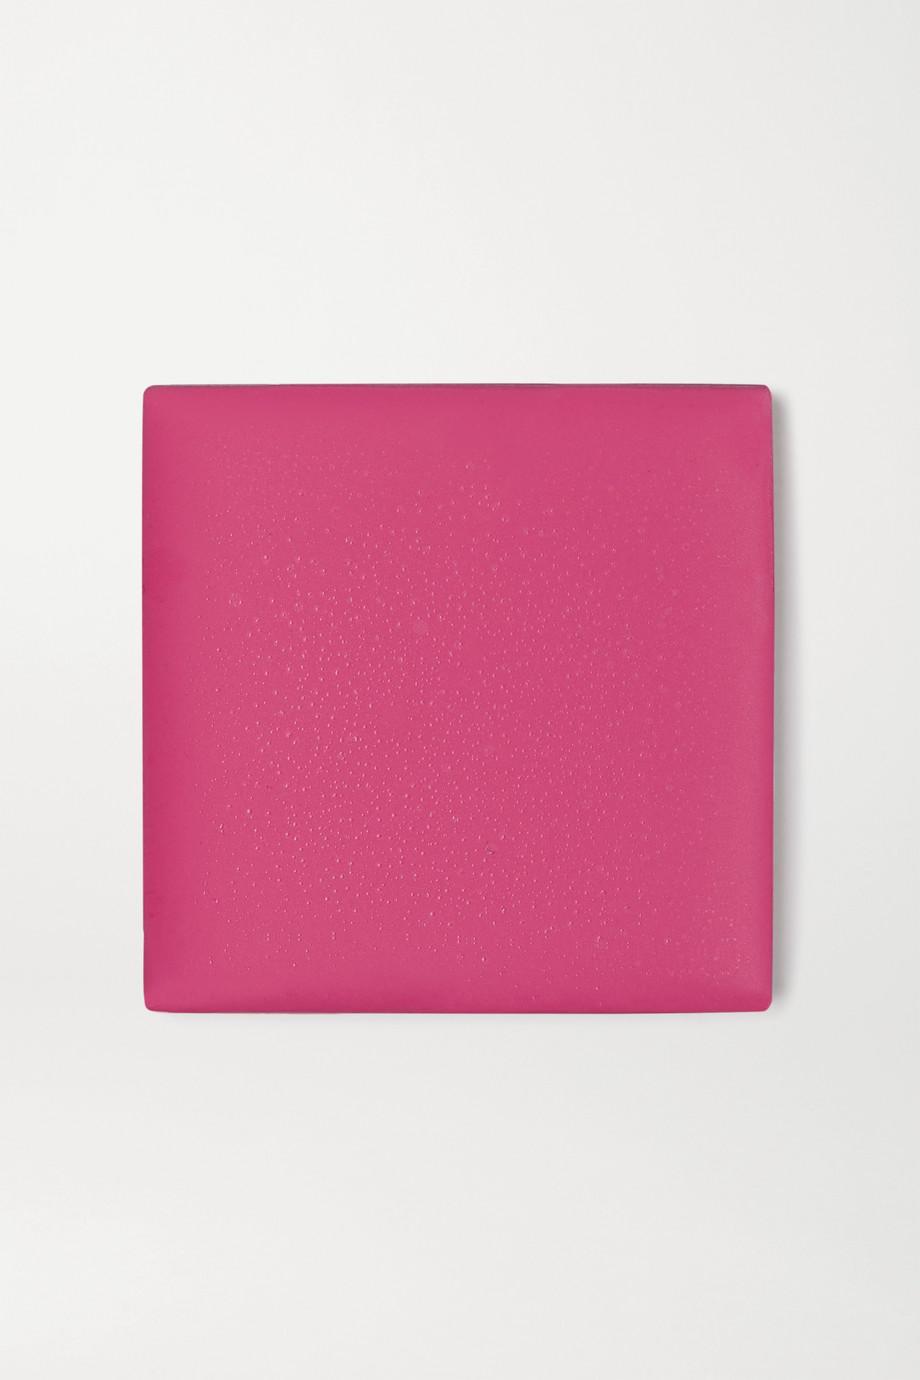 Kjaer Weis Cream Blush Refill - Happy